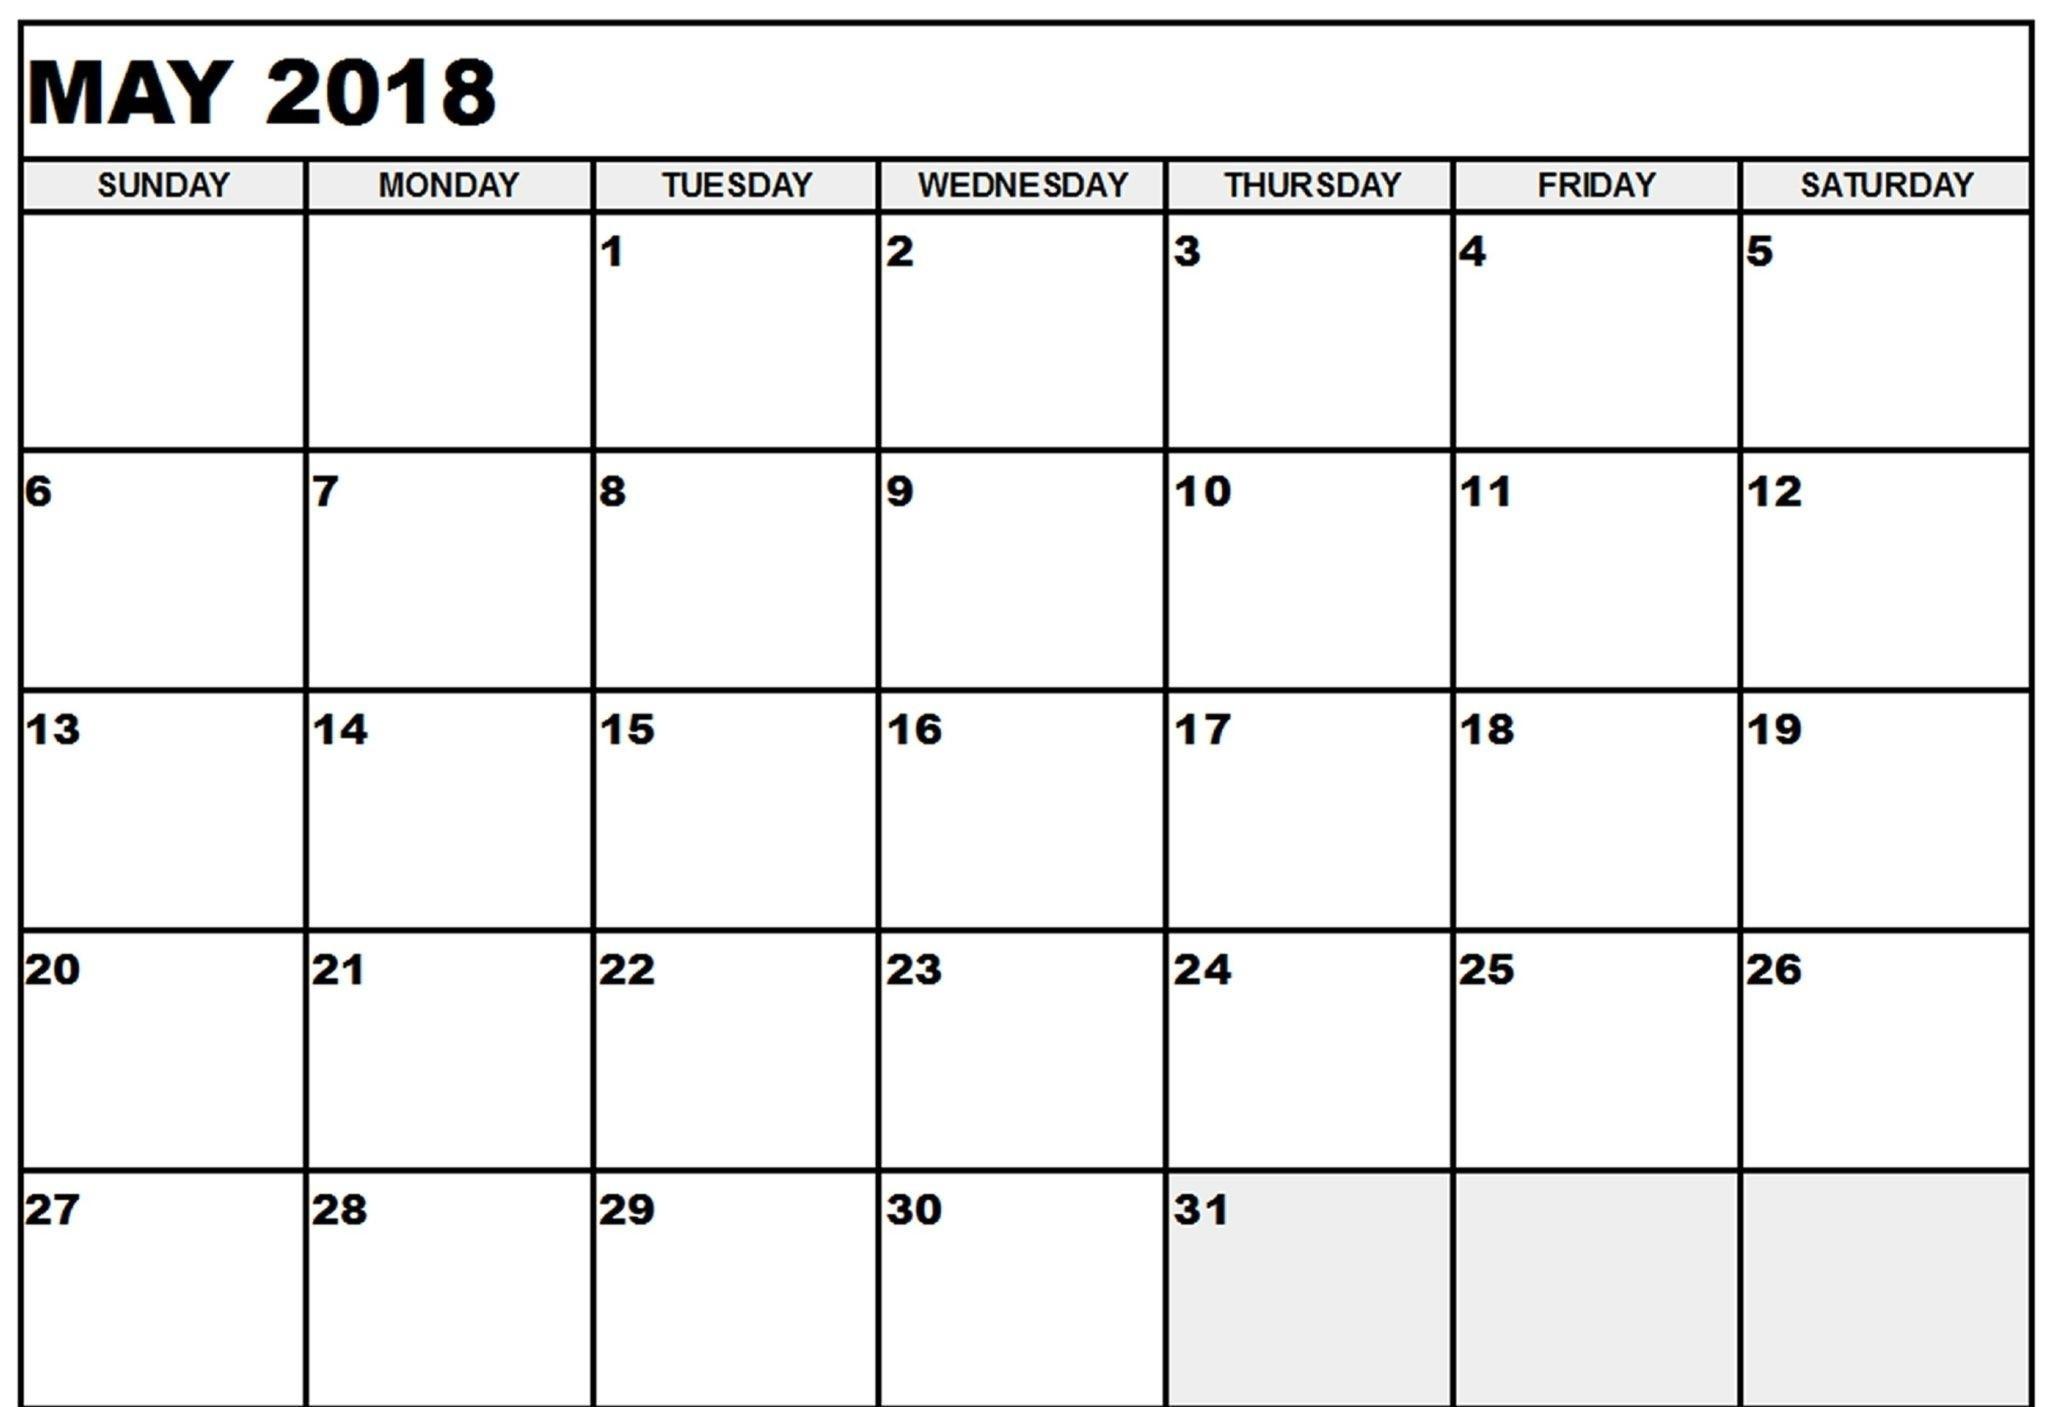 Julian Date Calendar 2019 - Maco.palmex.co throughout What Is Todays Julian Date